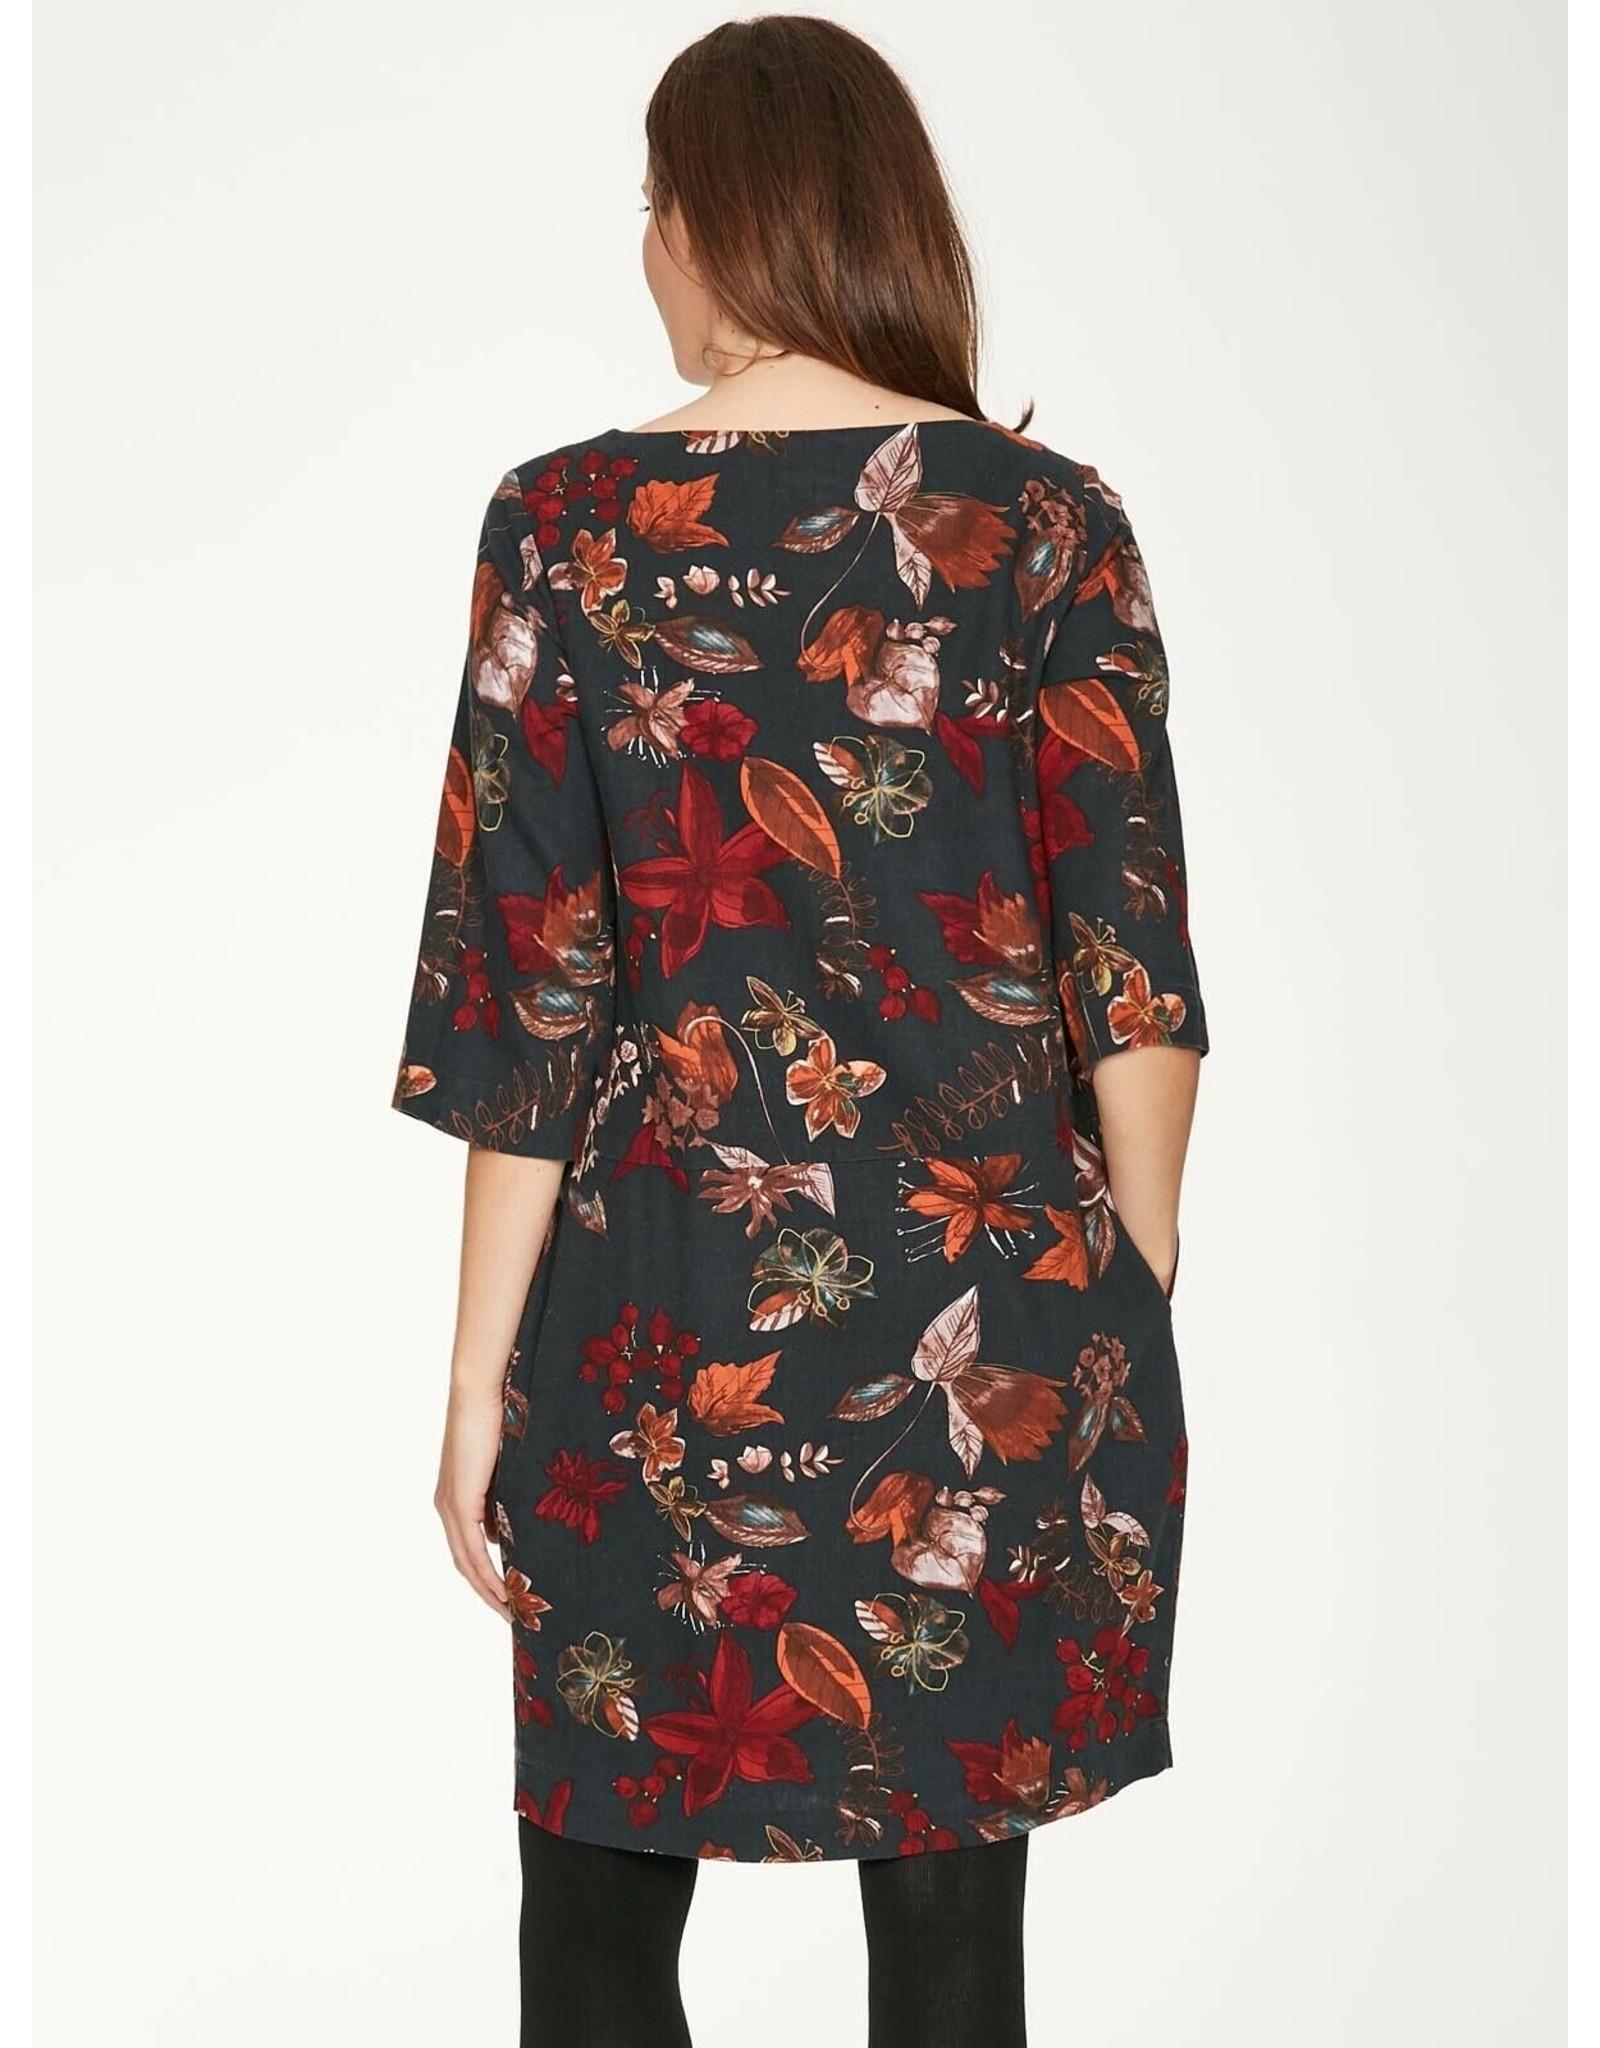 Thought Thought Josefa Dress